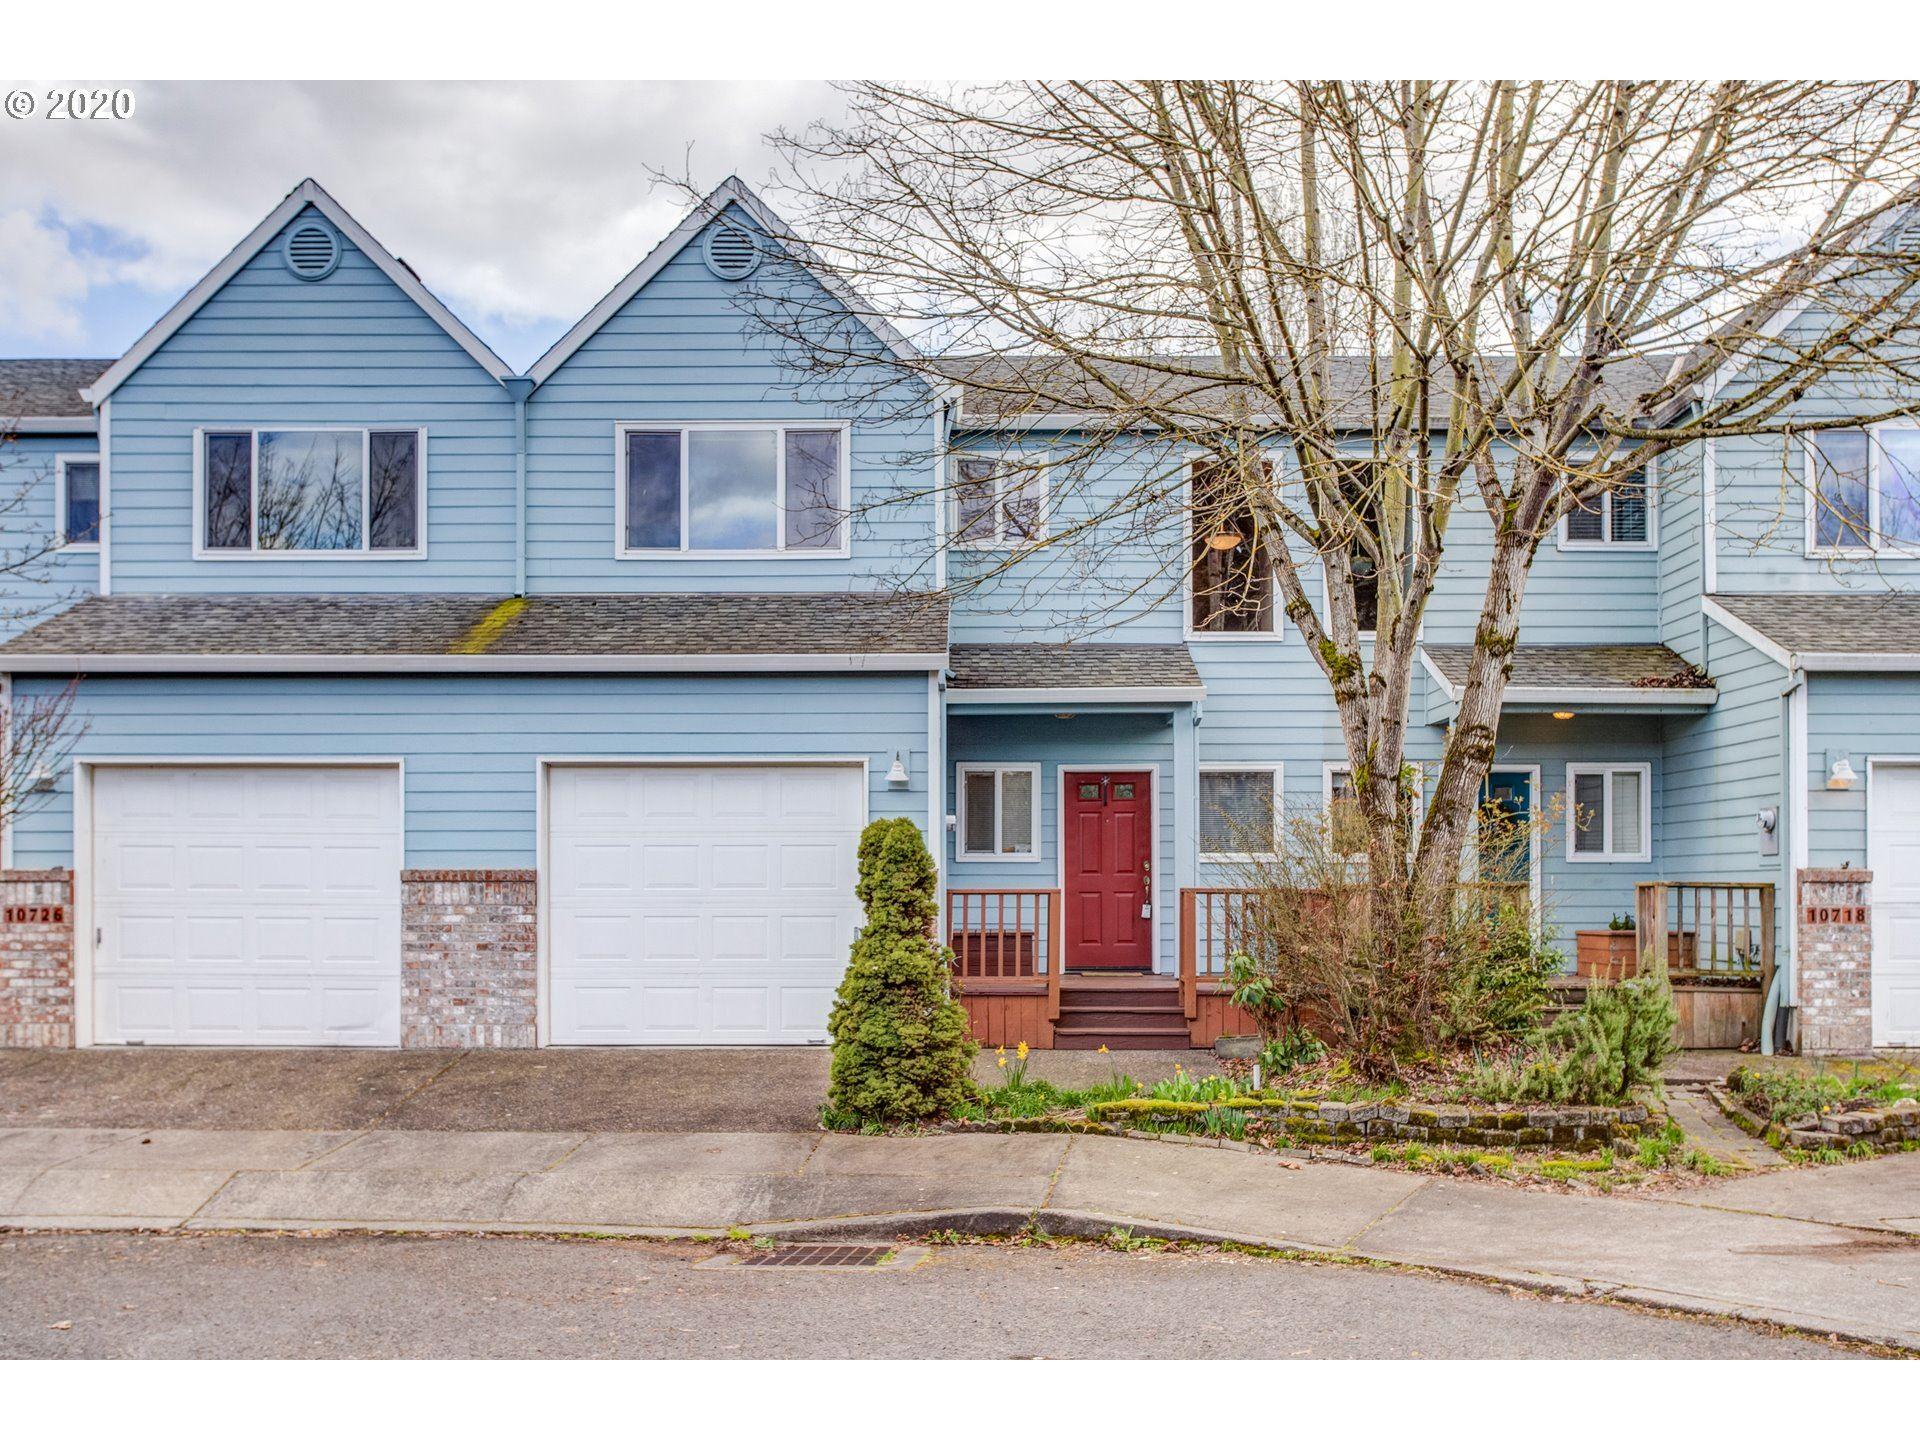 10722 NE 5TH AVE, Portland, OR 97211 - MLS#: 20339520